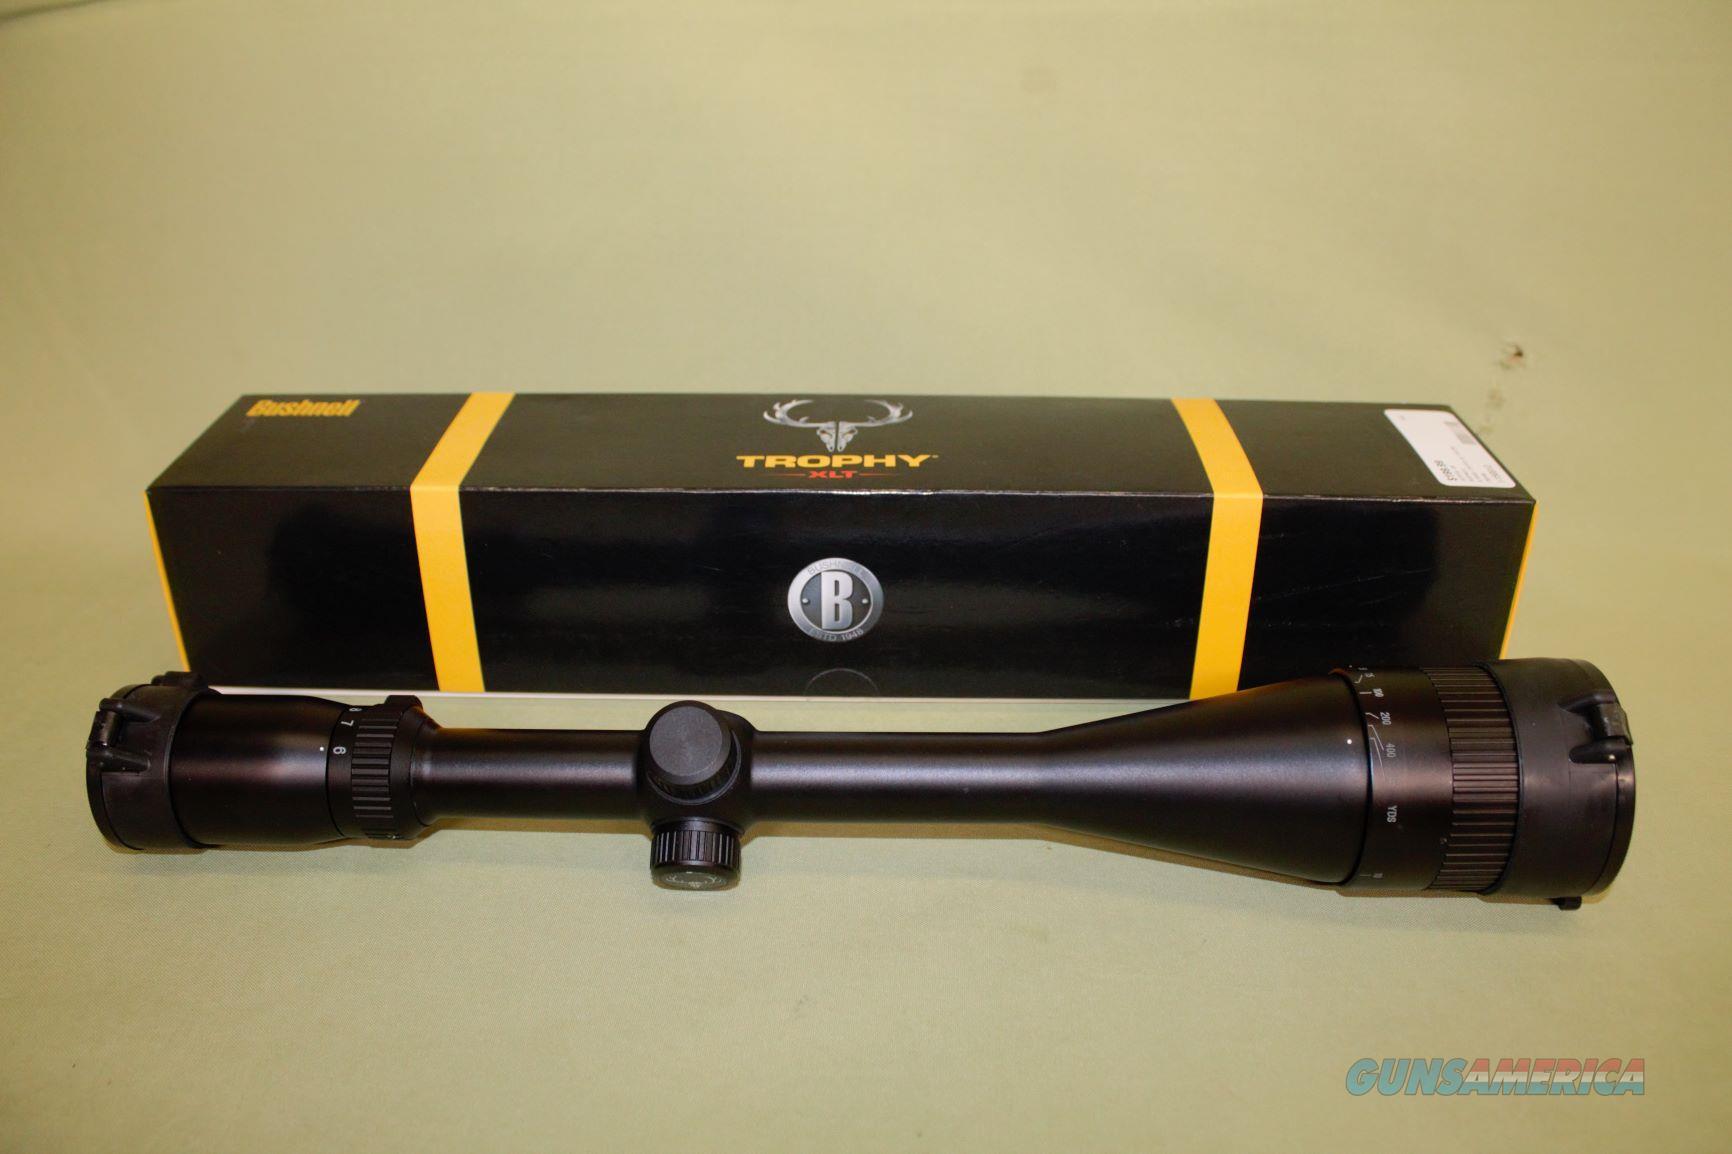 Bushnell Trophy XLT 6-18x50mm NIB  Non-Guns > Scopes/Mounts/Rings & Optics > Rifle Scopes > Variable Focal Length